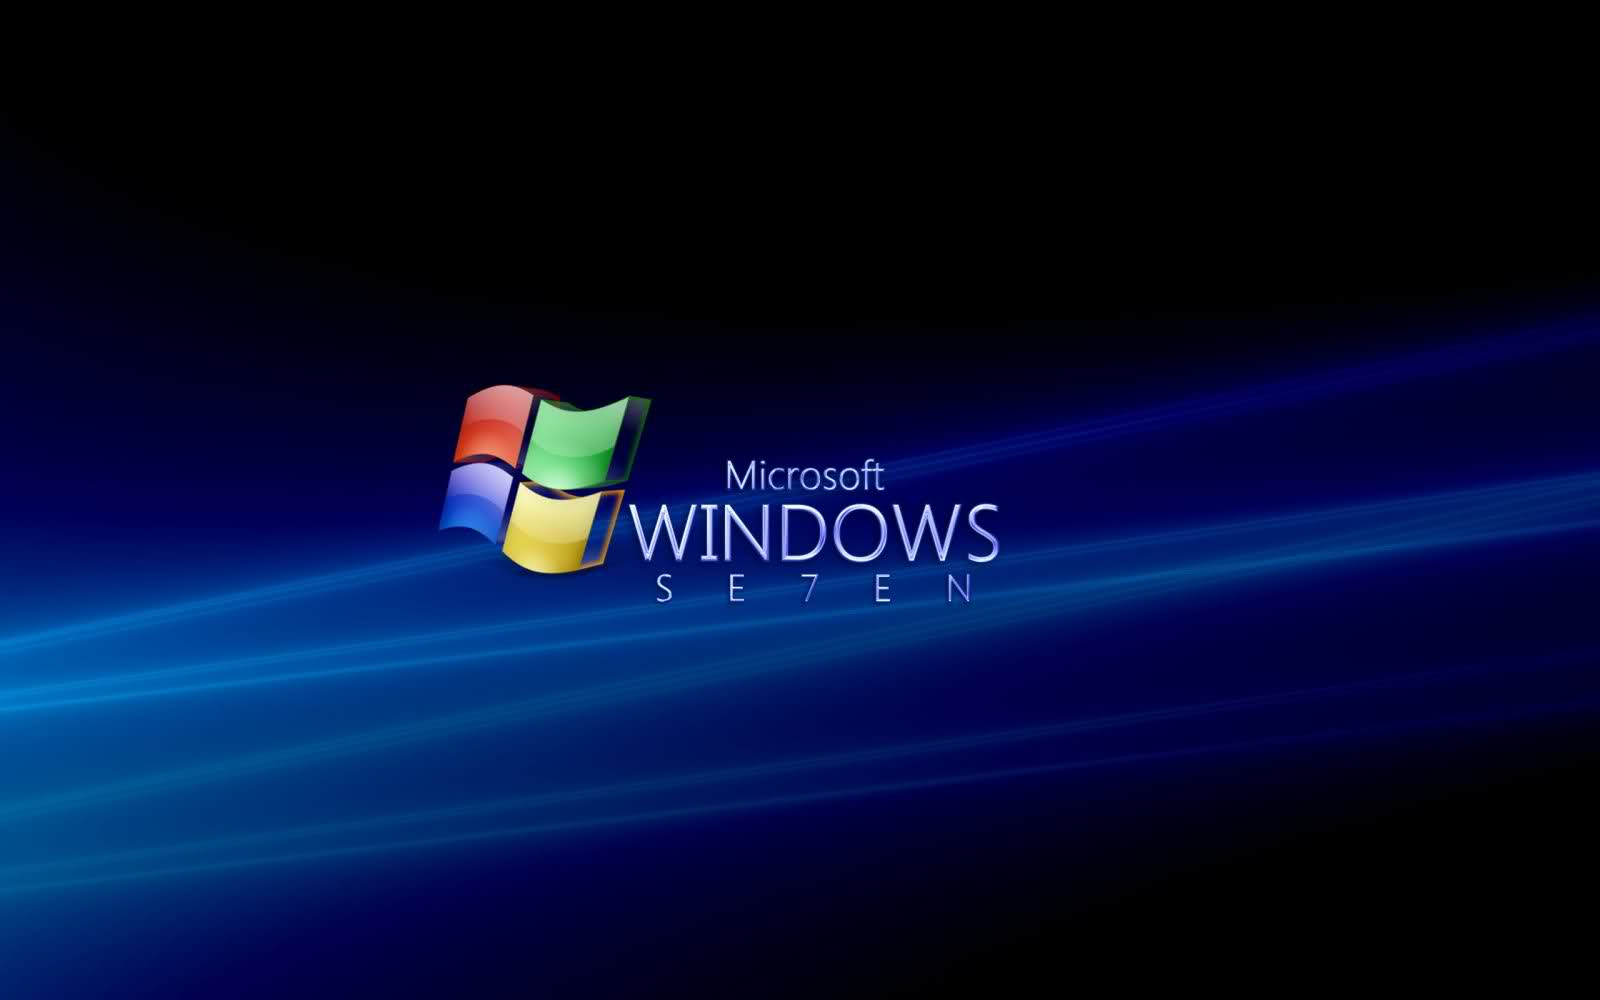 Custom Windows 7 Wallpapers   Page 79   Windows 7 Help Forums 1600x1000